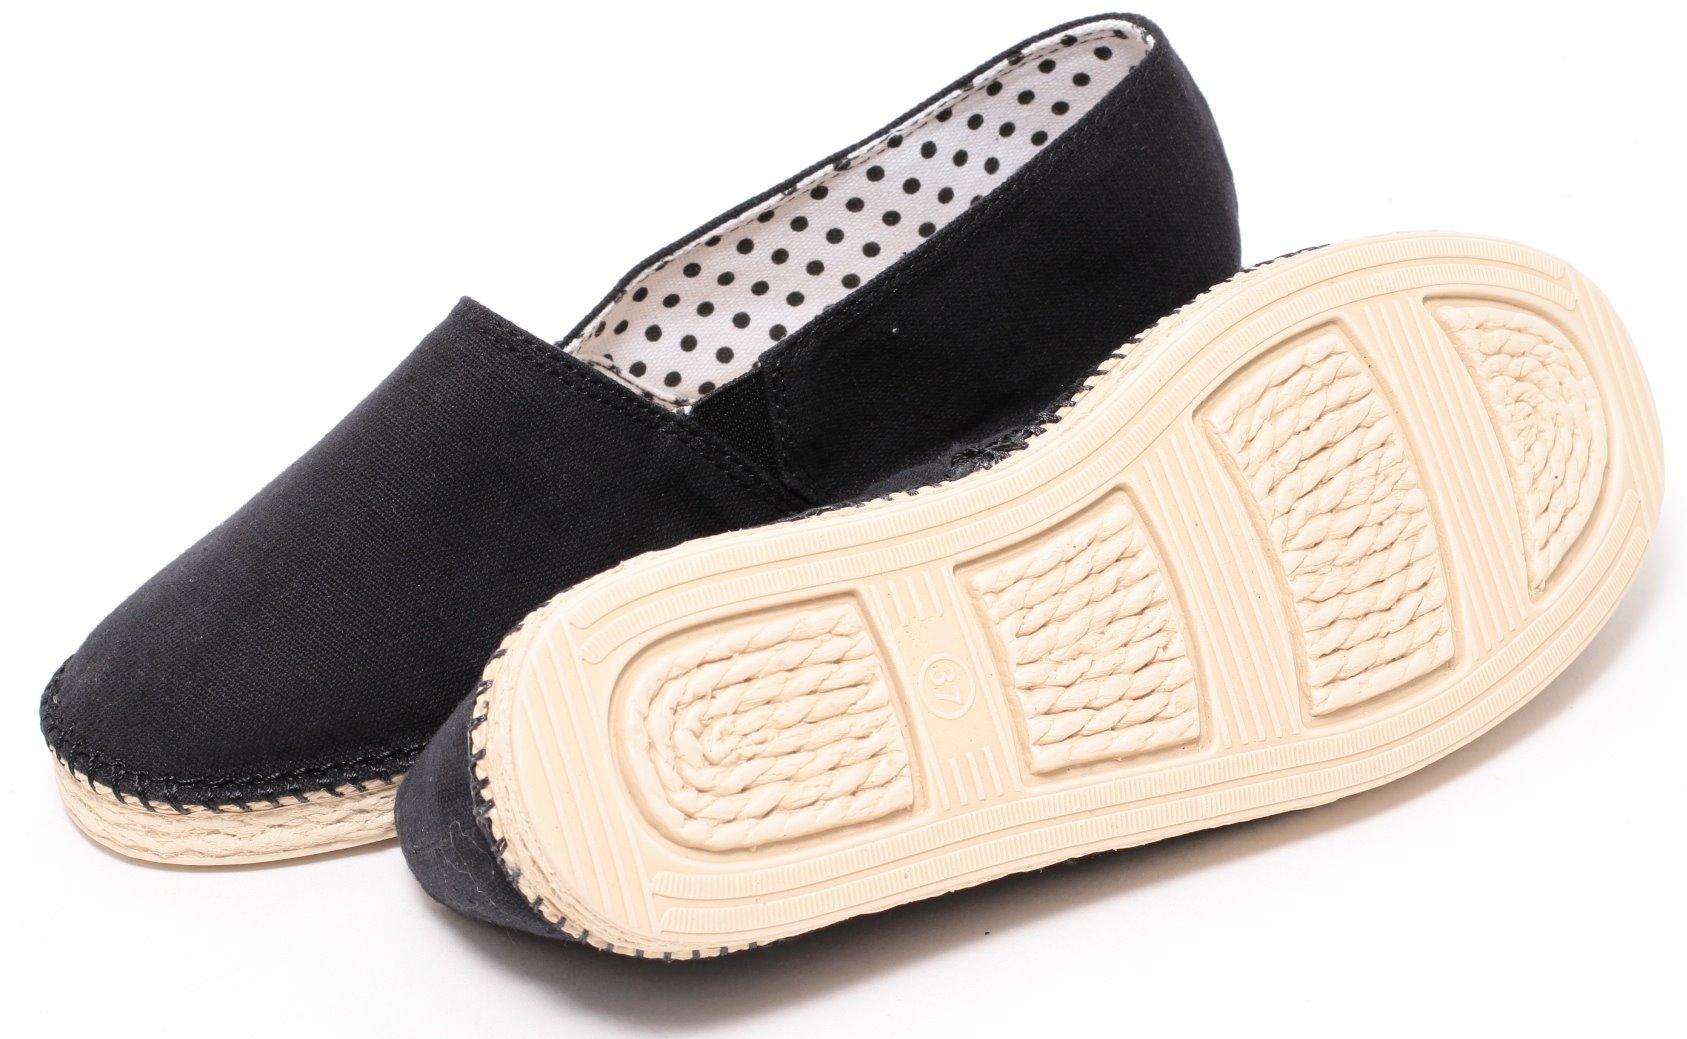 separation shoes e5df0 cf772 Damen Mädchen Sommer Slipper Gr. 37-41 Stoffschuhe Pantolette Sandale  schwarz